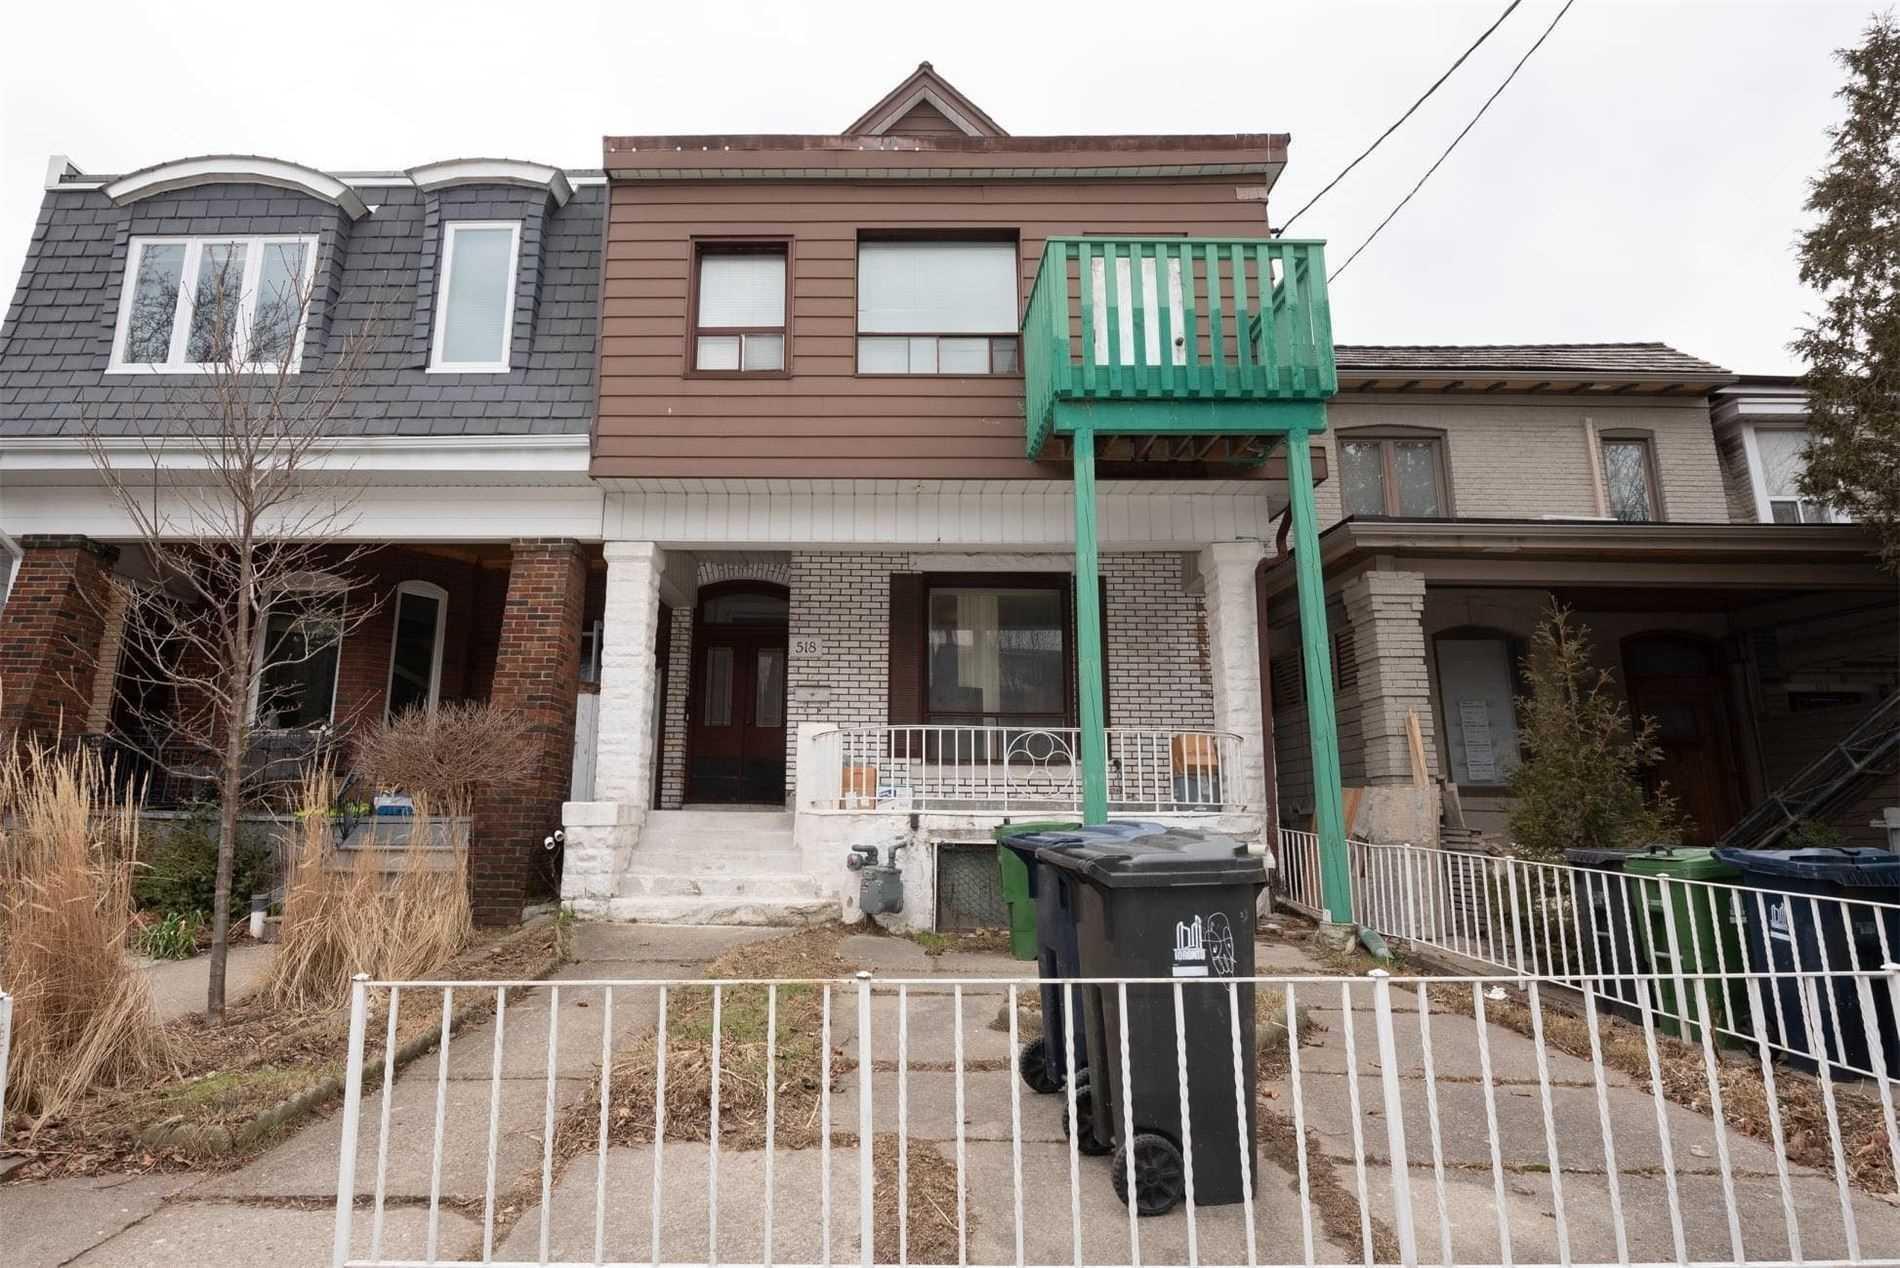 518 Manning Ave, Toronto, Ontario M6G2V7, 7 Bedrooms Bedrooms, 20 Rooms Rooms,5 BathroomsBathrooms,Semi-detached,For Sale,Manning,C5123321